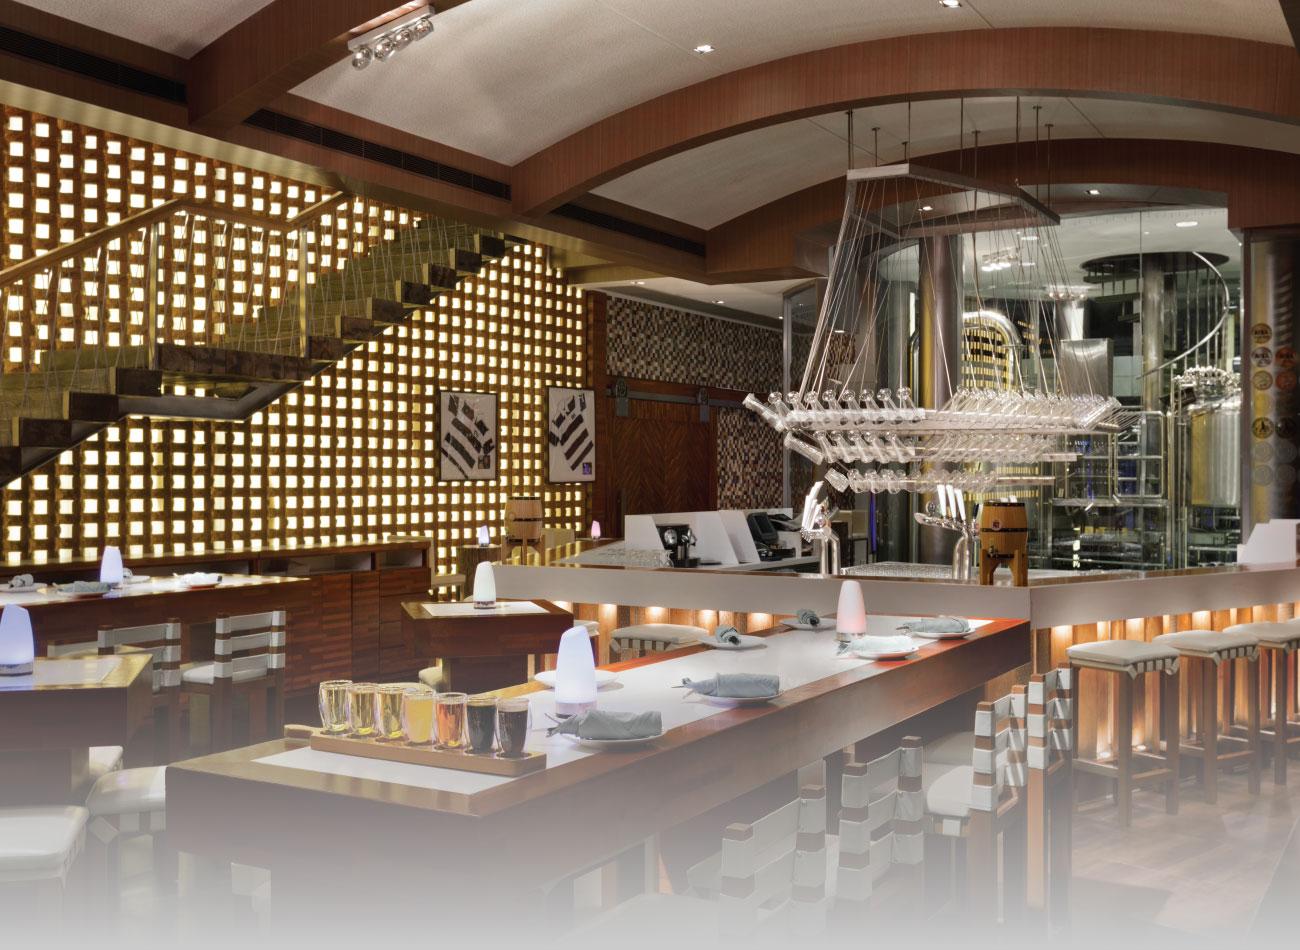 82 Hospitality Interior Design Jobs Hong Kong Hotel